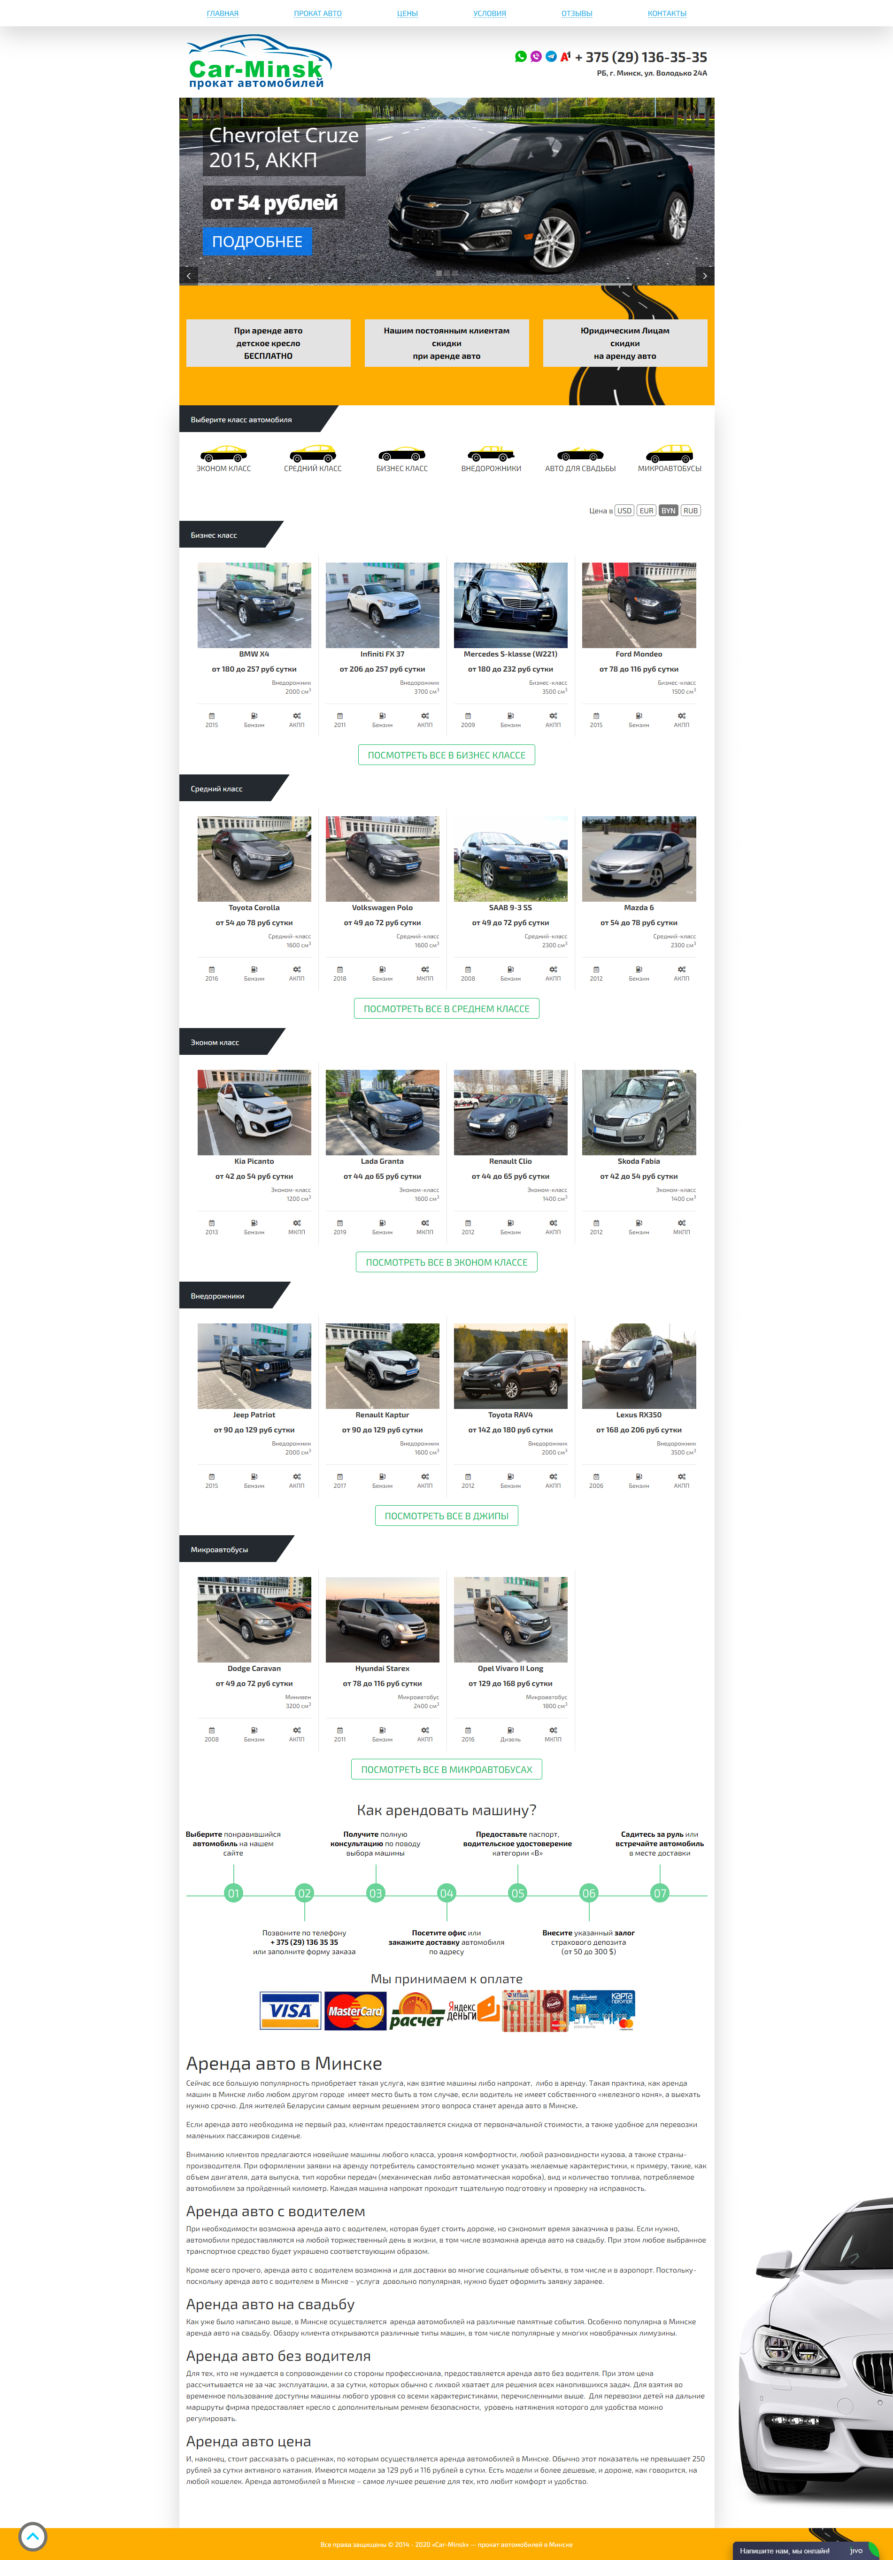 Разработка сайта car-minsk.by